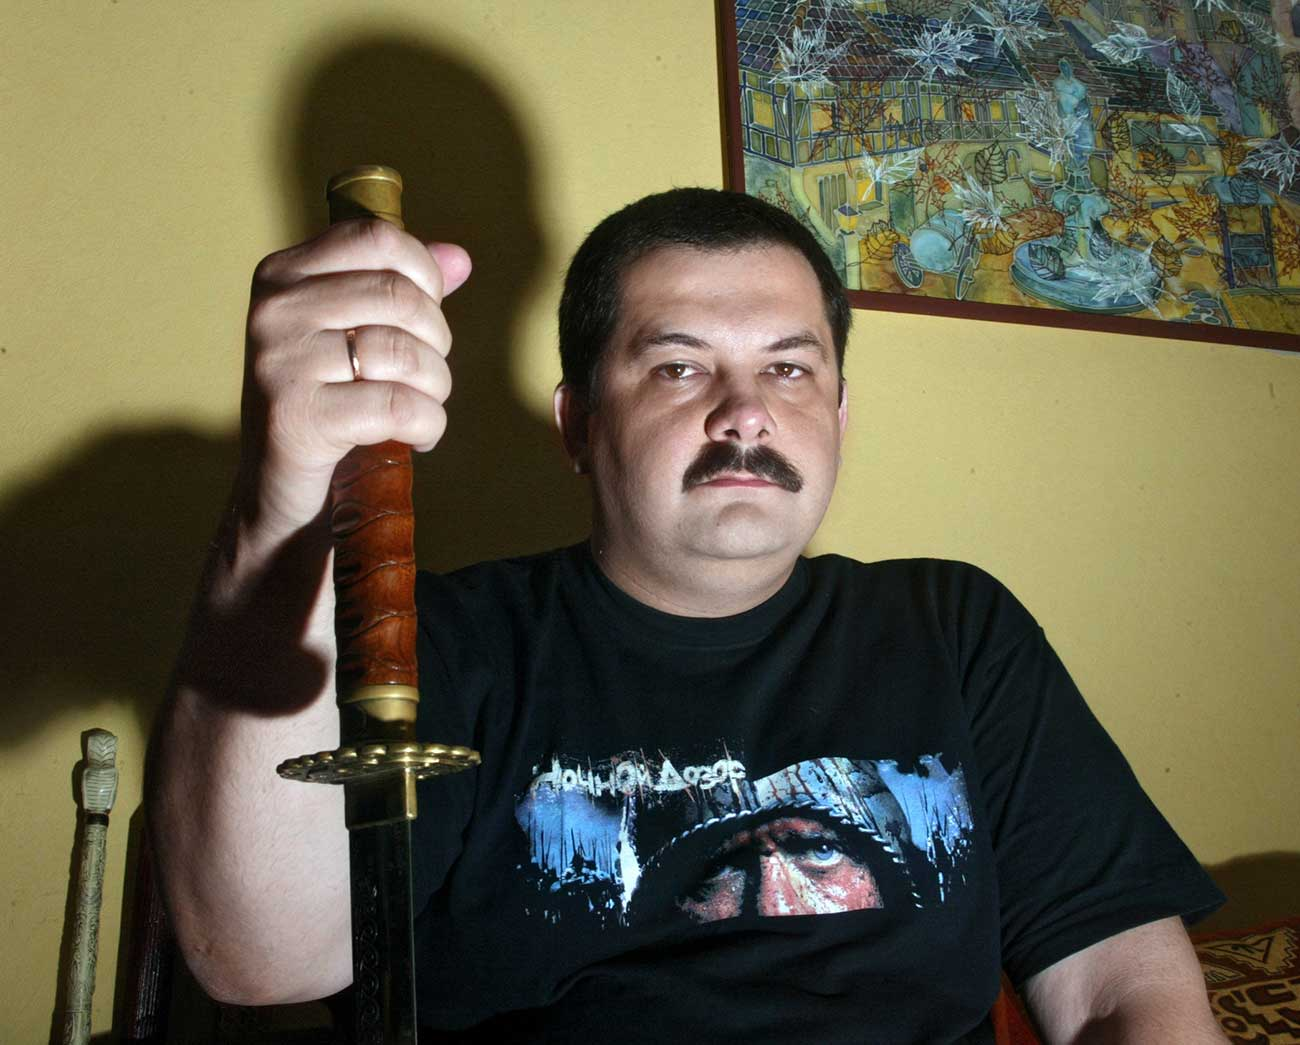 Sergei Lukyanenko / Kommersant